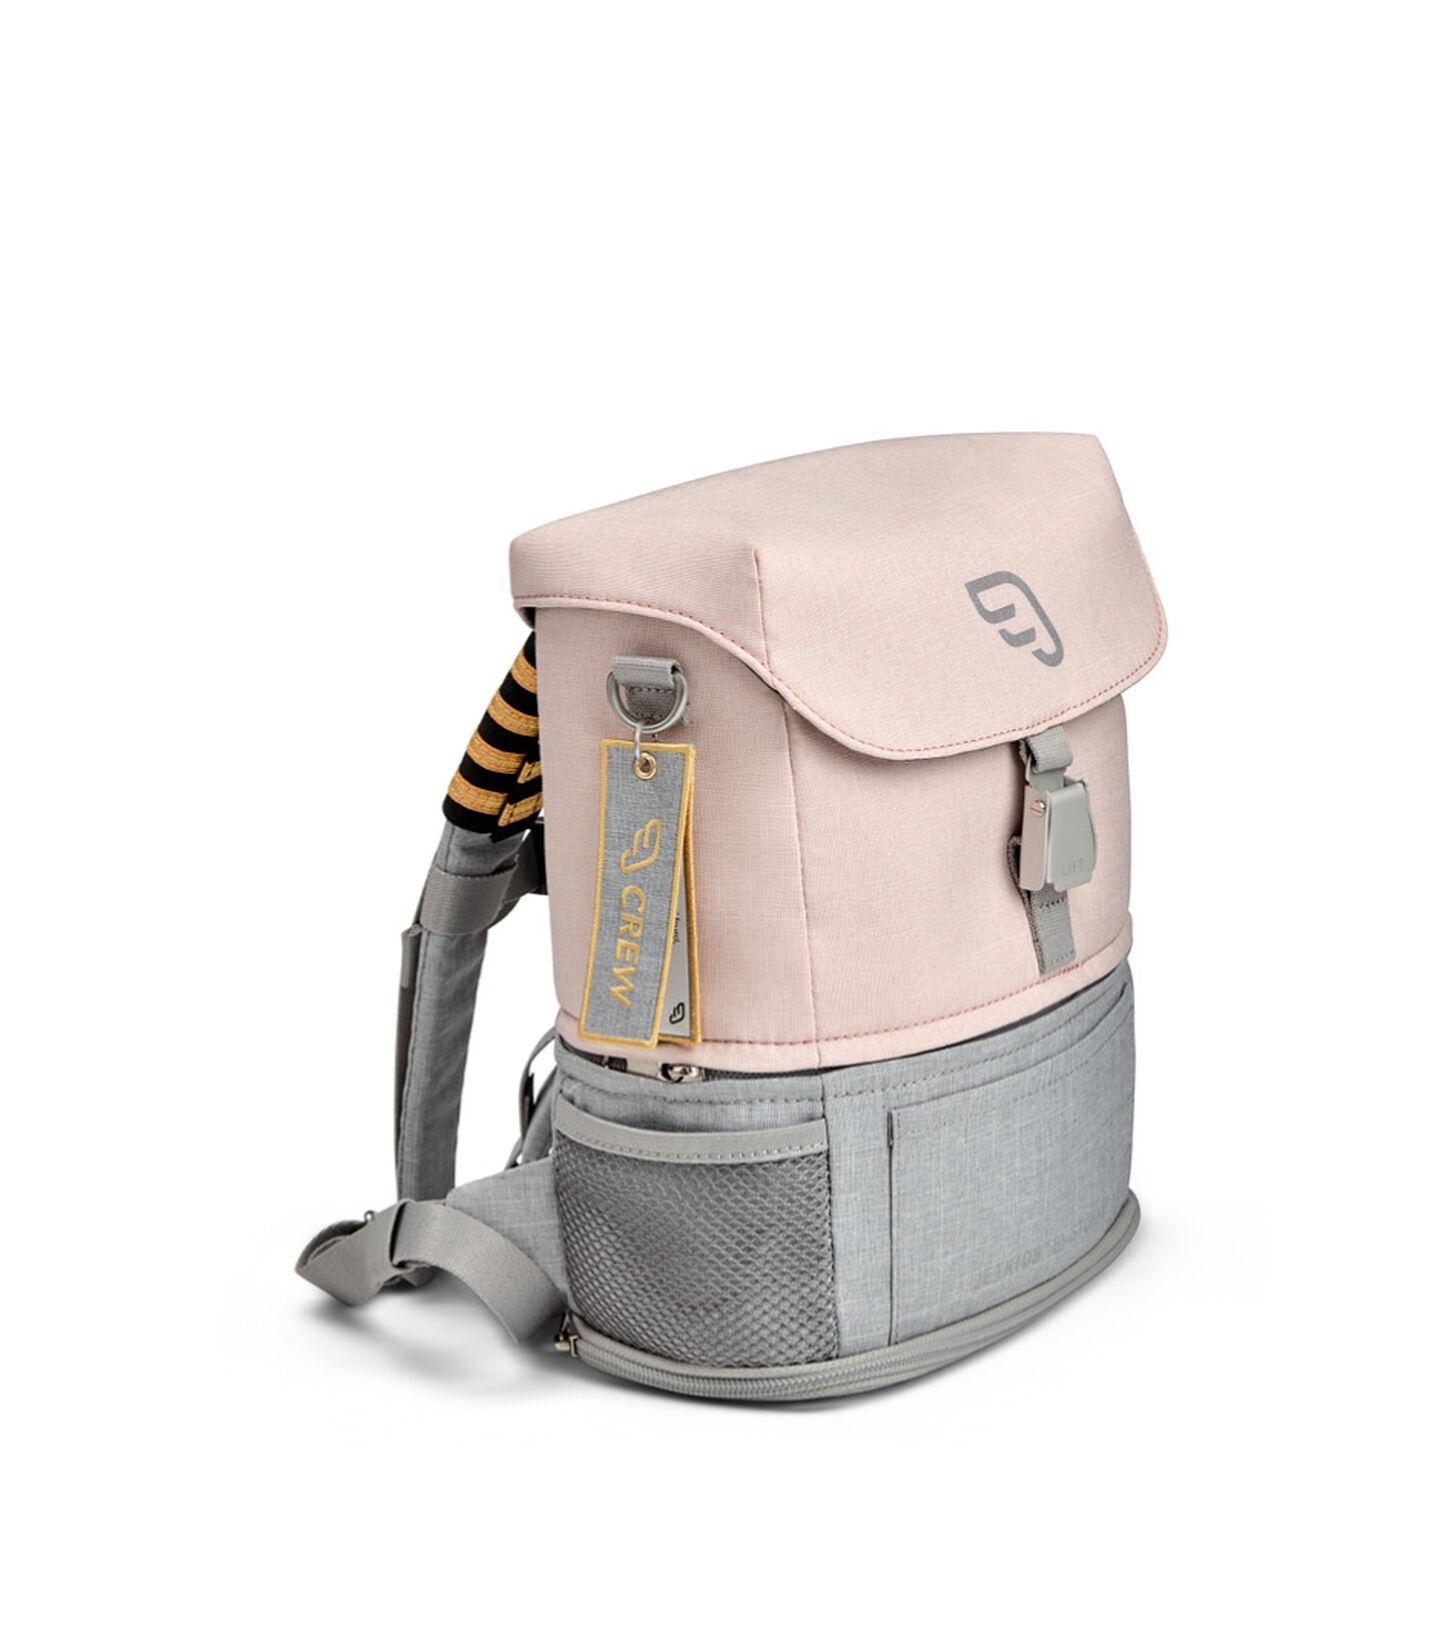 JETKIDS Crew Backpack Pink Lemonade, Pink Lemonade, mainview view 1